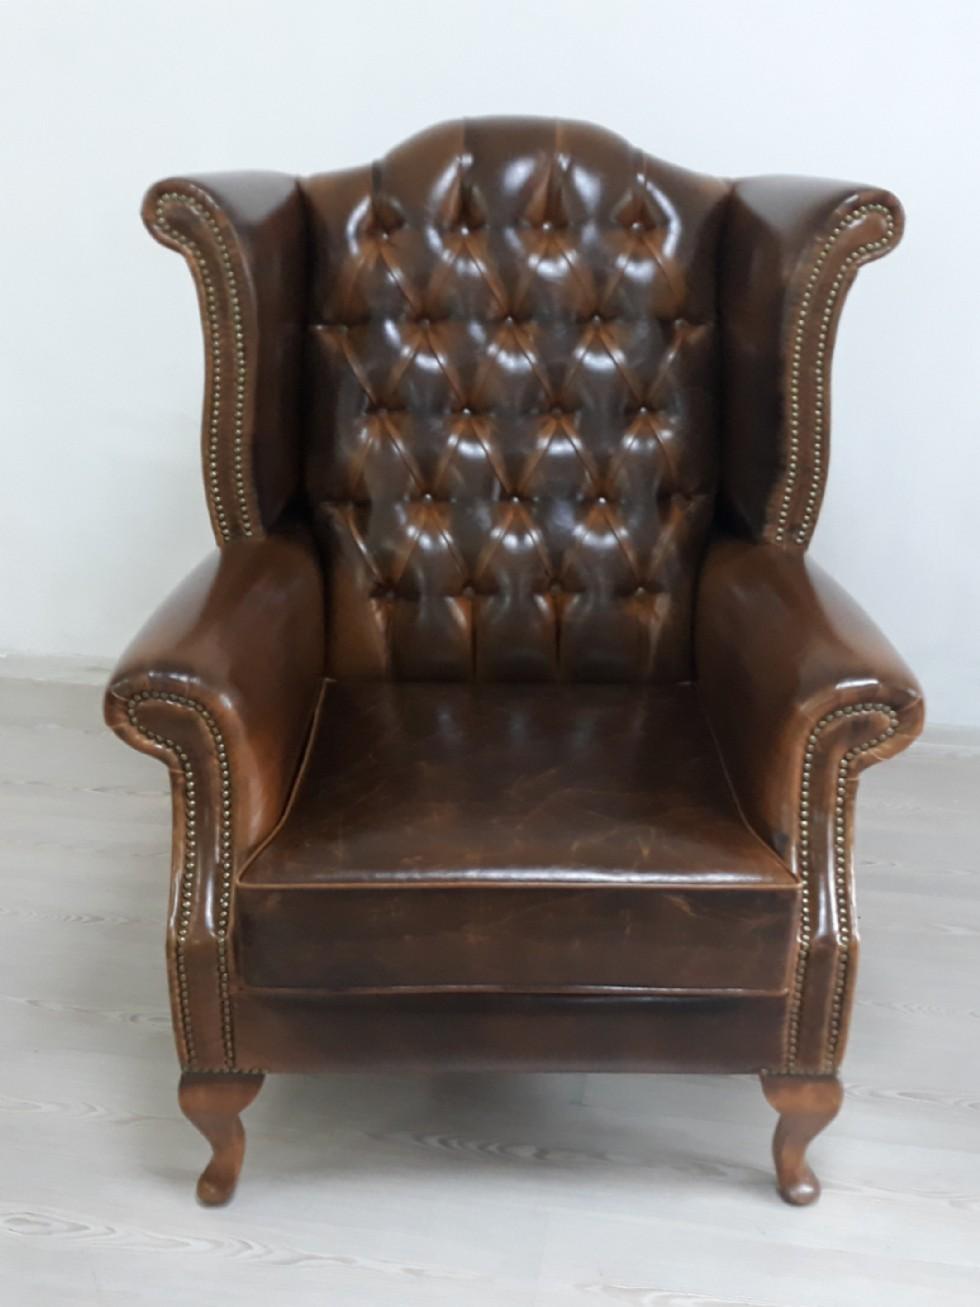 Kodu: 10281 - Chesterfield Sofa Models